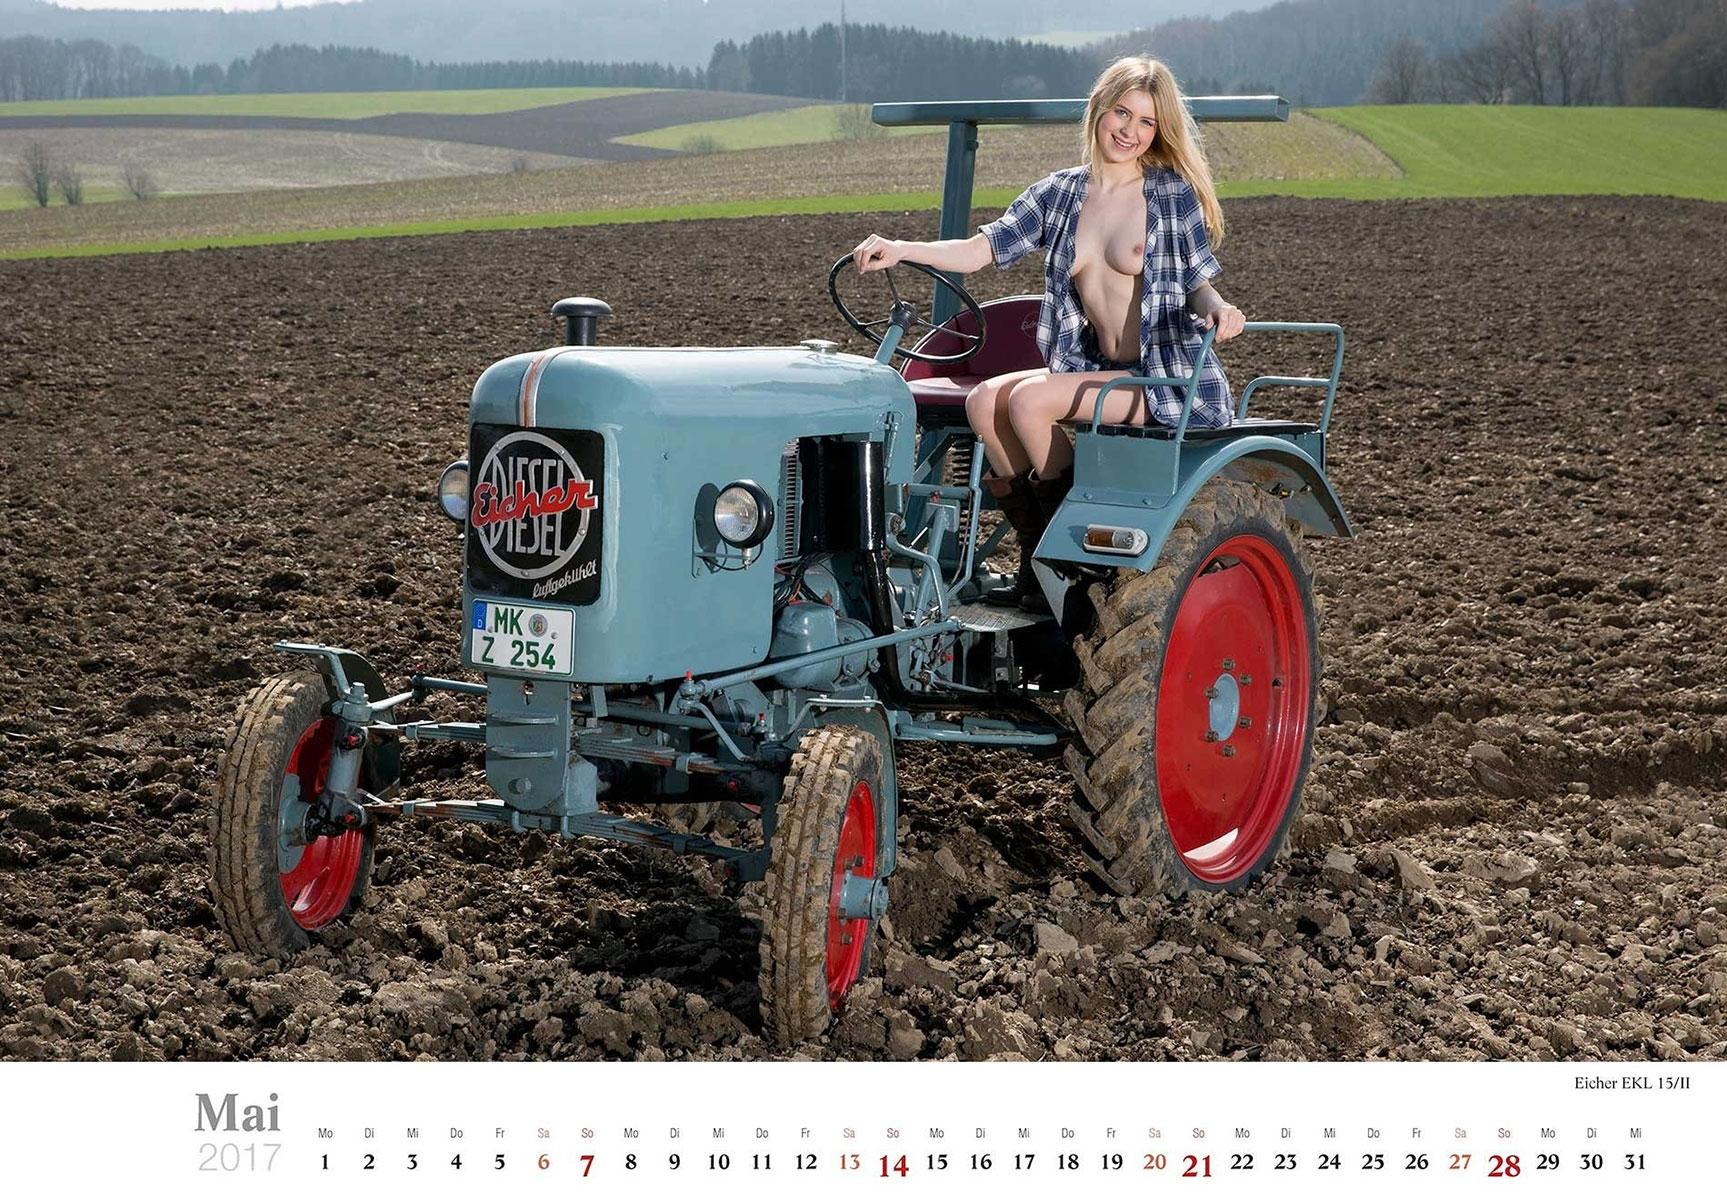 Девушки и трактора в эротическом календаре 2017 / Eicher EKL 15/II - Jungbauerntraume calendar 2017